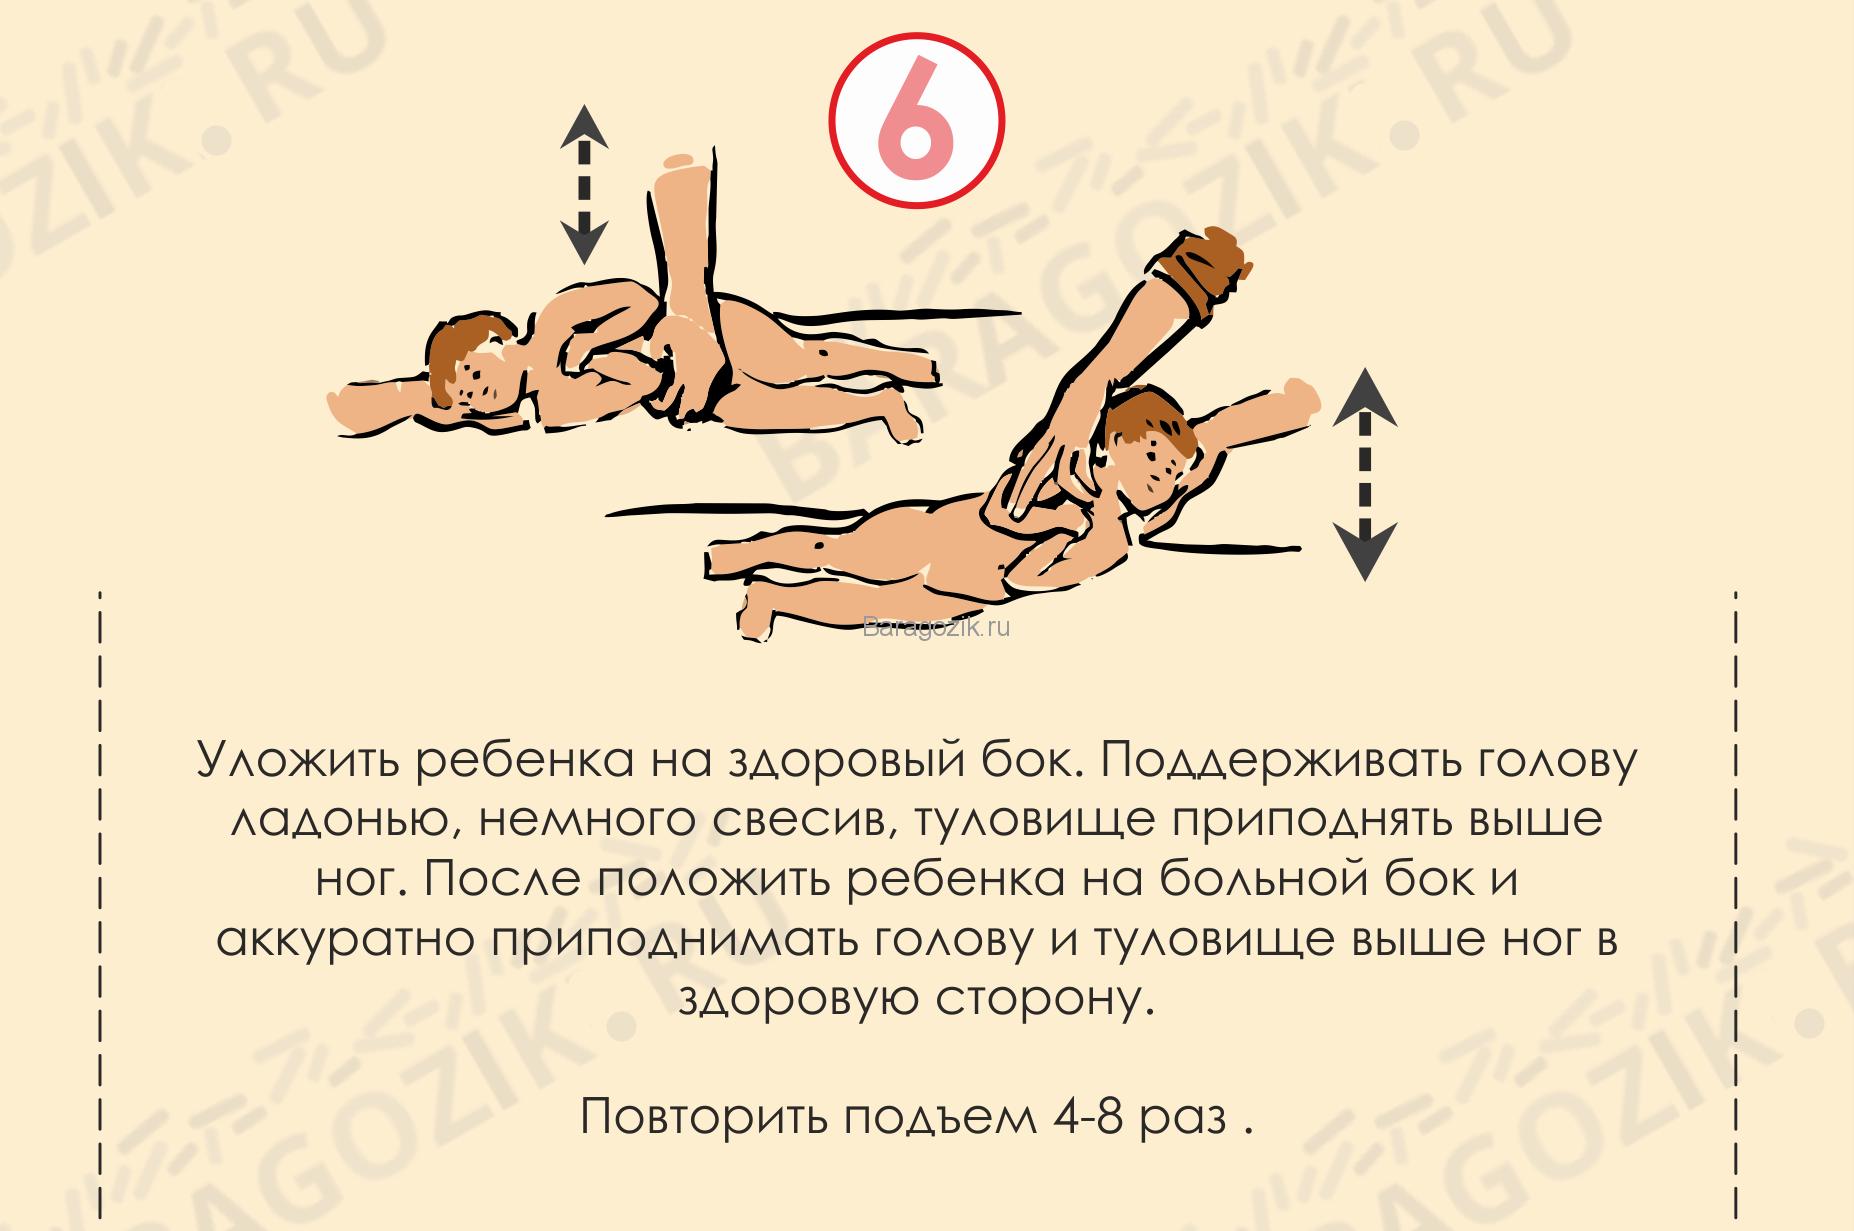 Кривошея у ребенка 3 месяца как укладывать